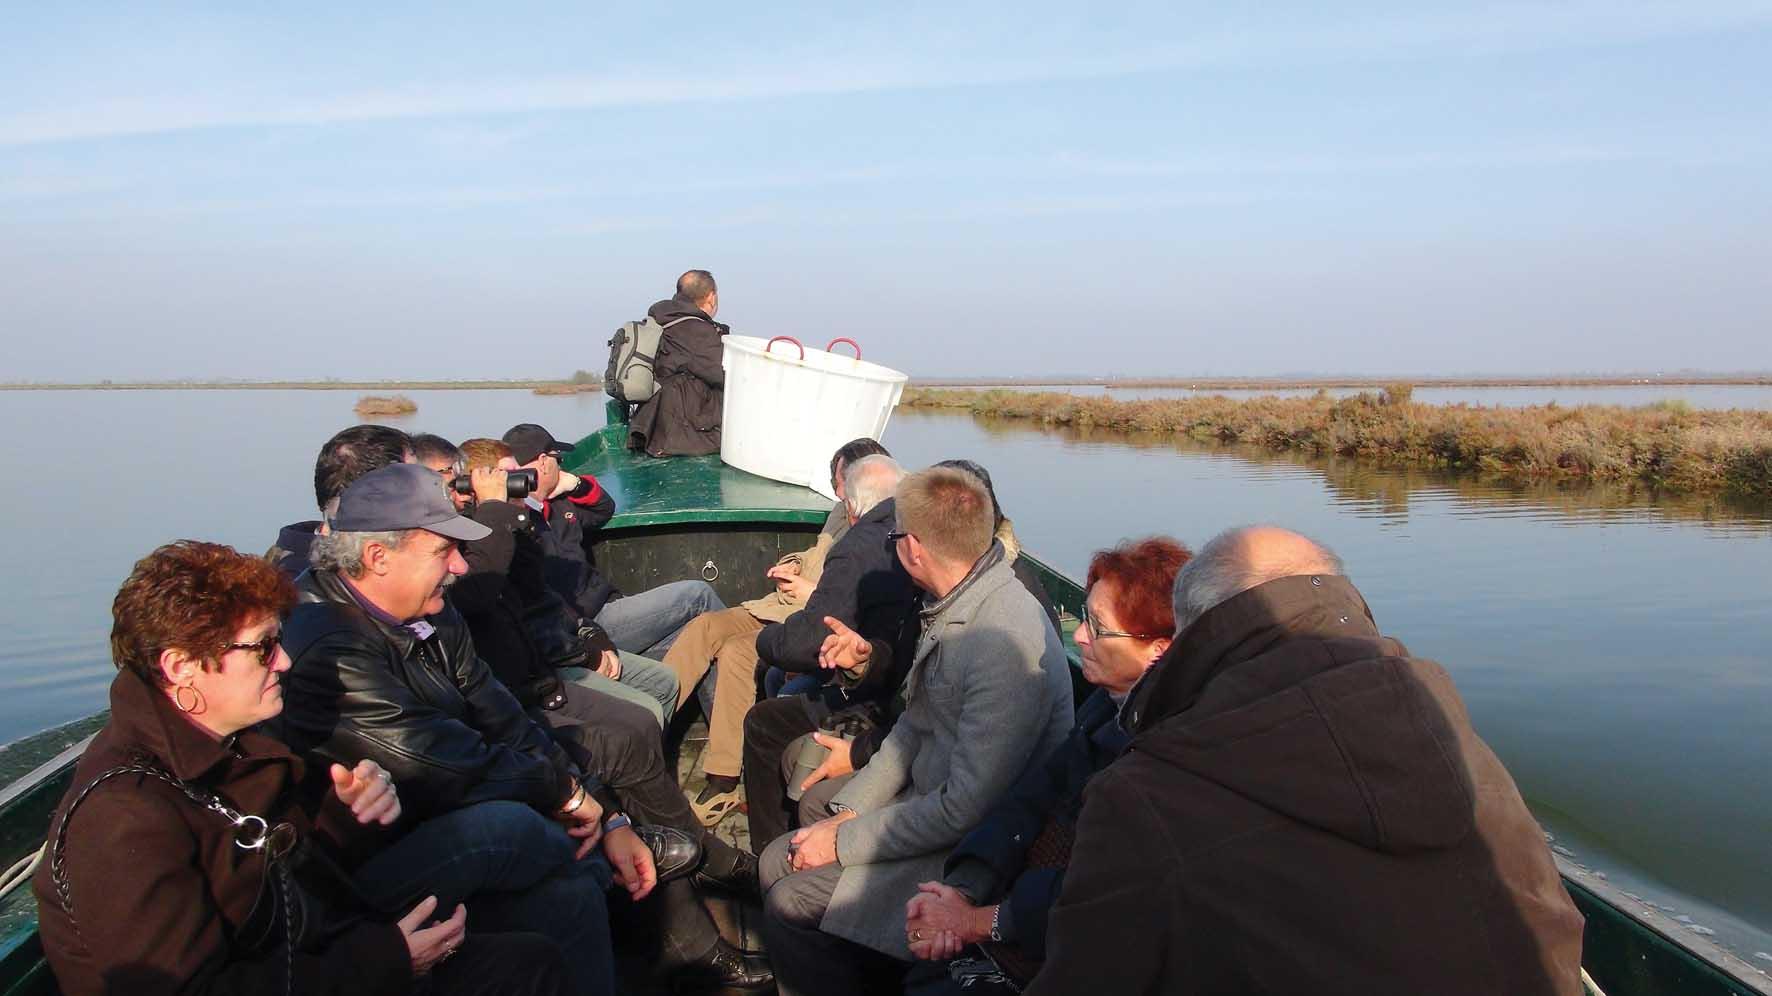 provincia venezia III commissione visita riserca naturale laguna 1 1